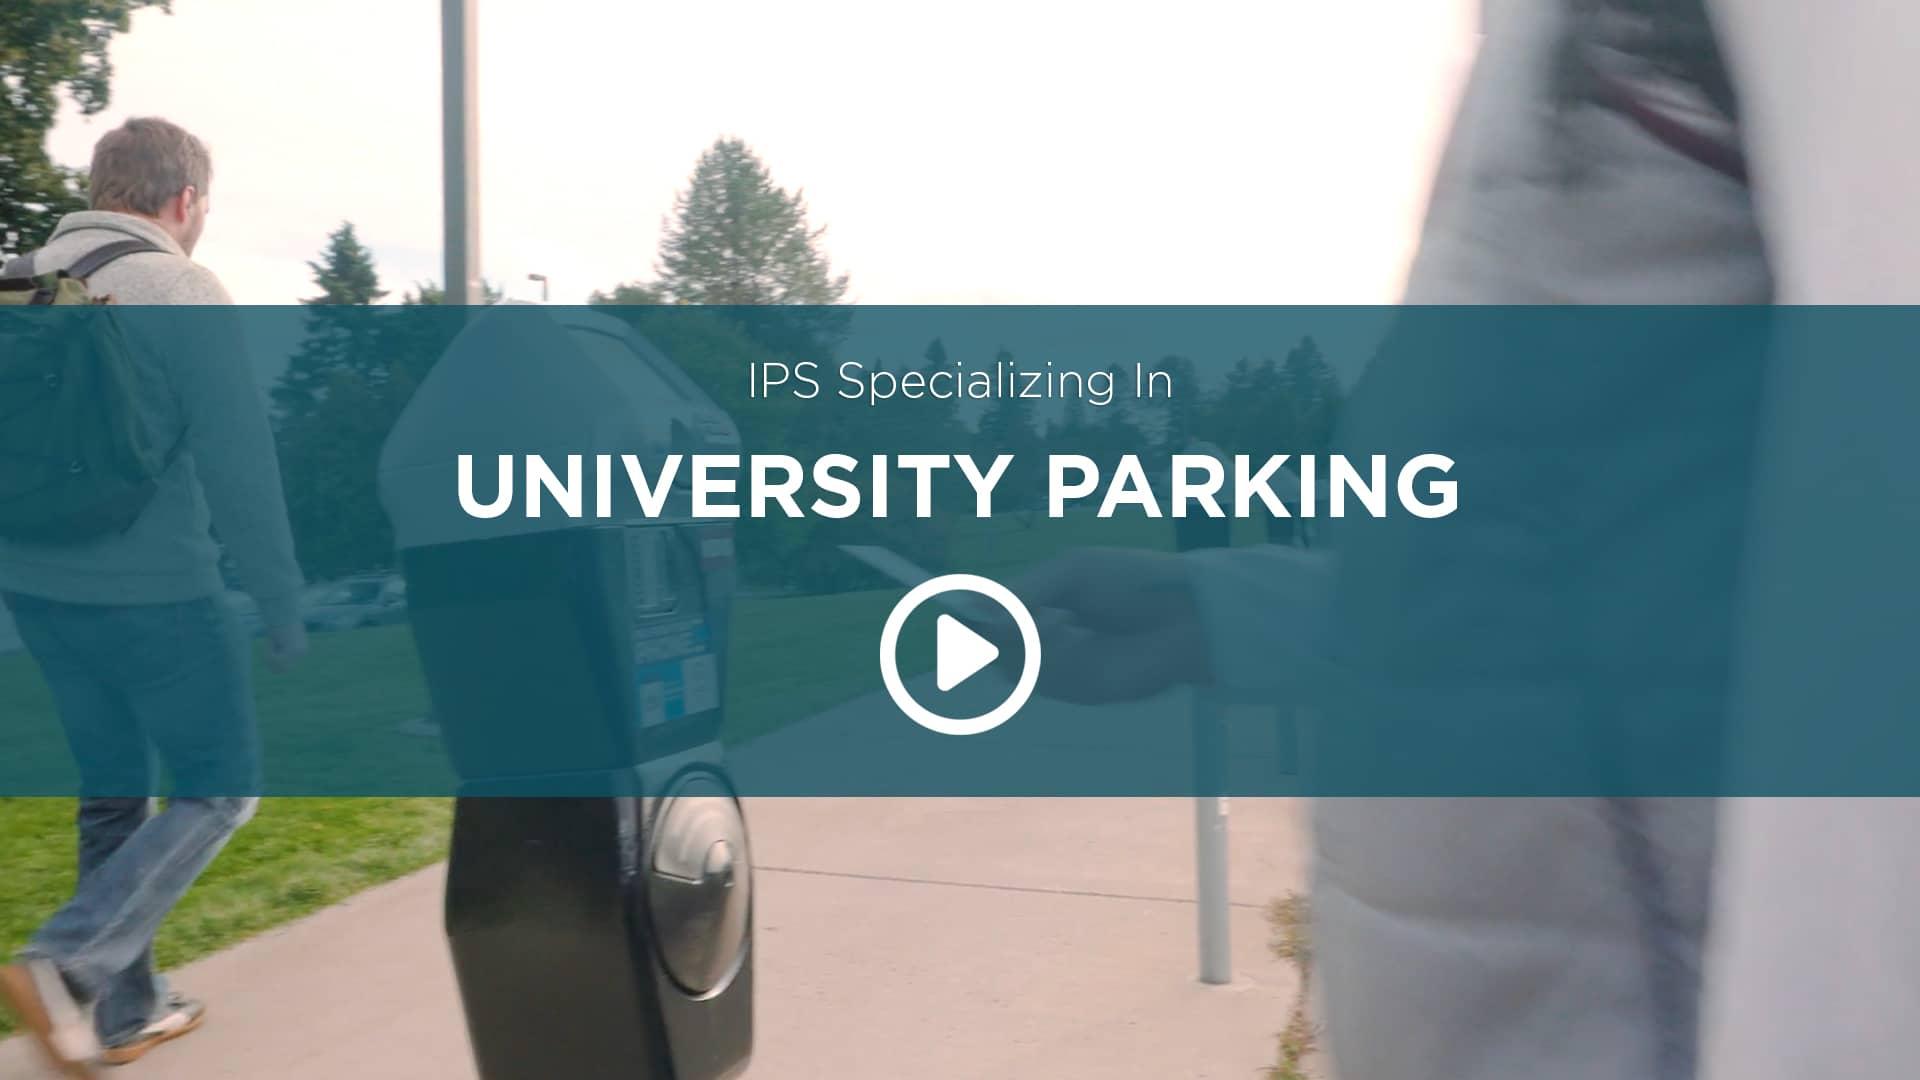 IPS Specializing In University Parking